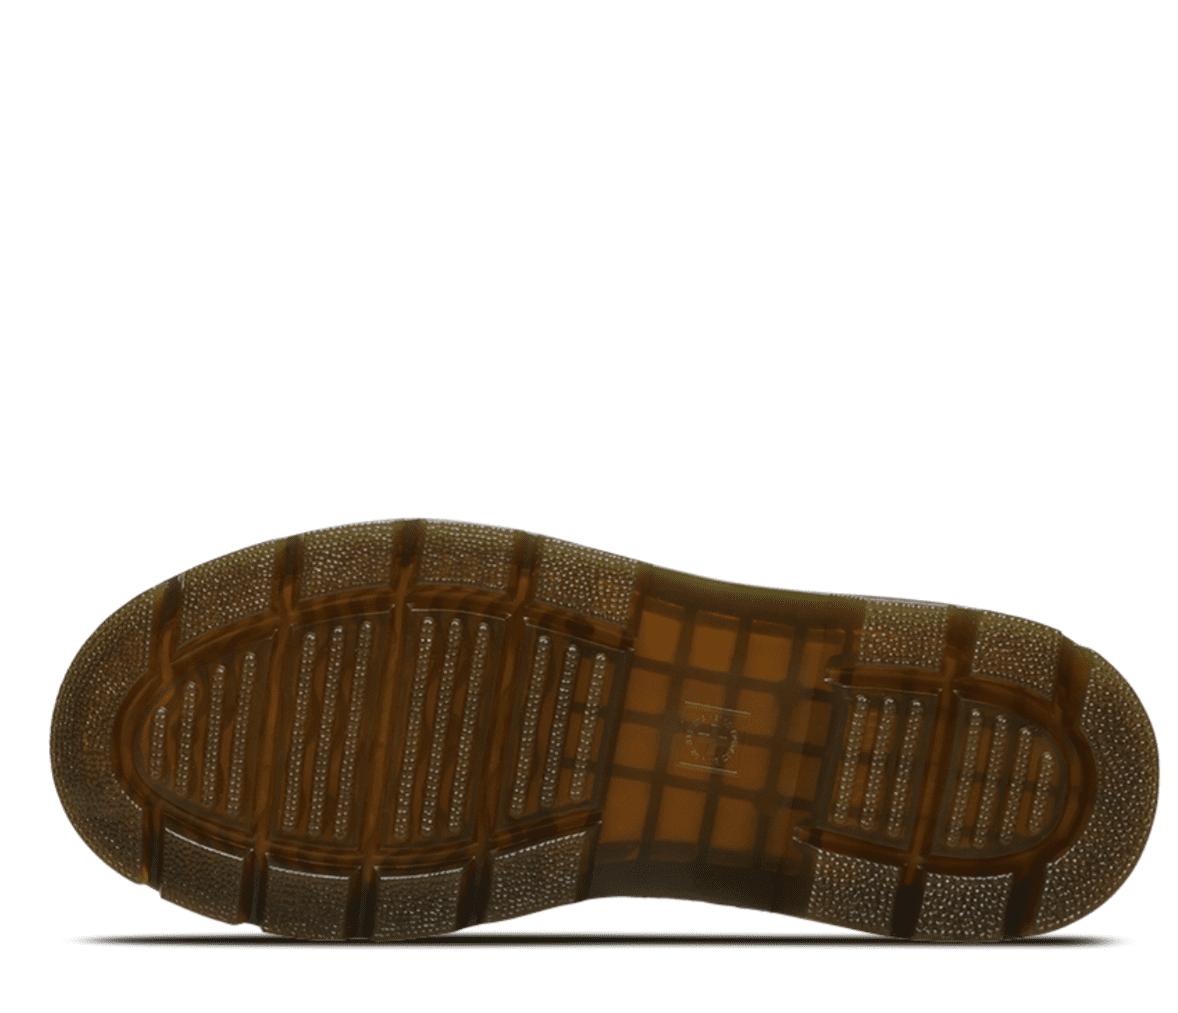 Dr. Martens Unisex Adult Combs Olive 8 Eye Boots 6 UK (7 US Men / 8 US Women) M US